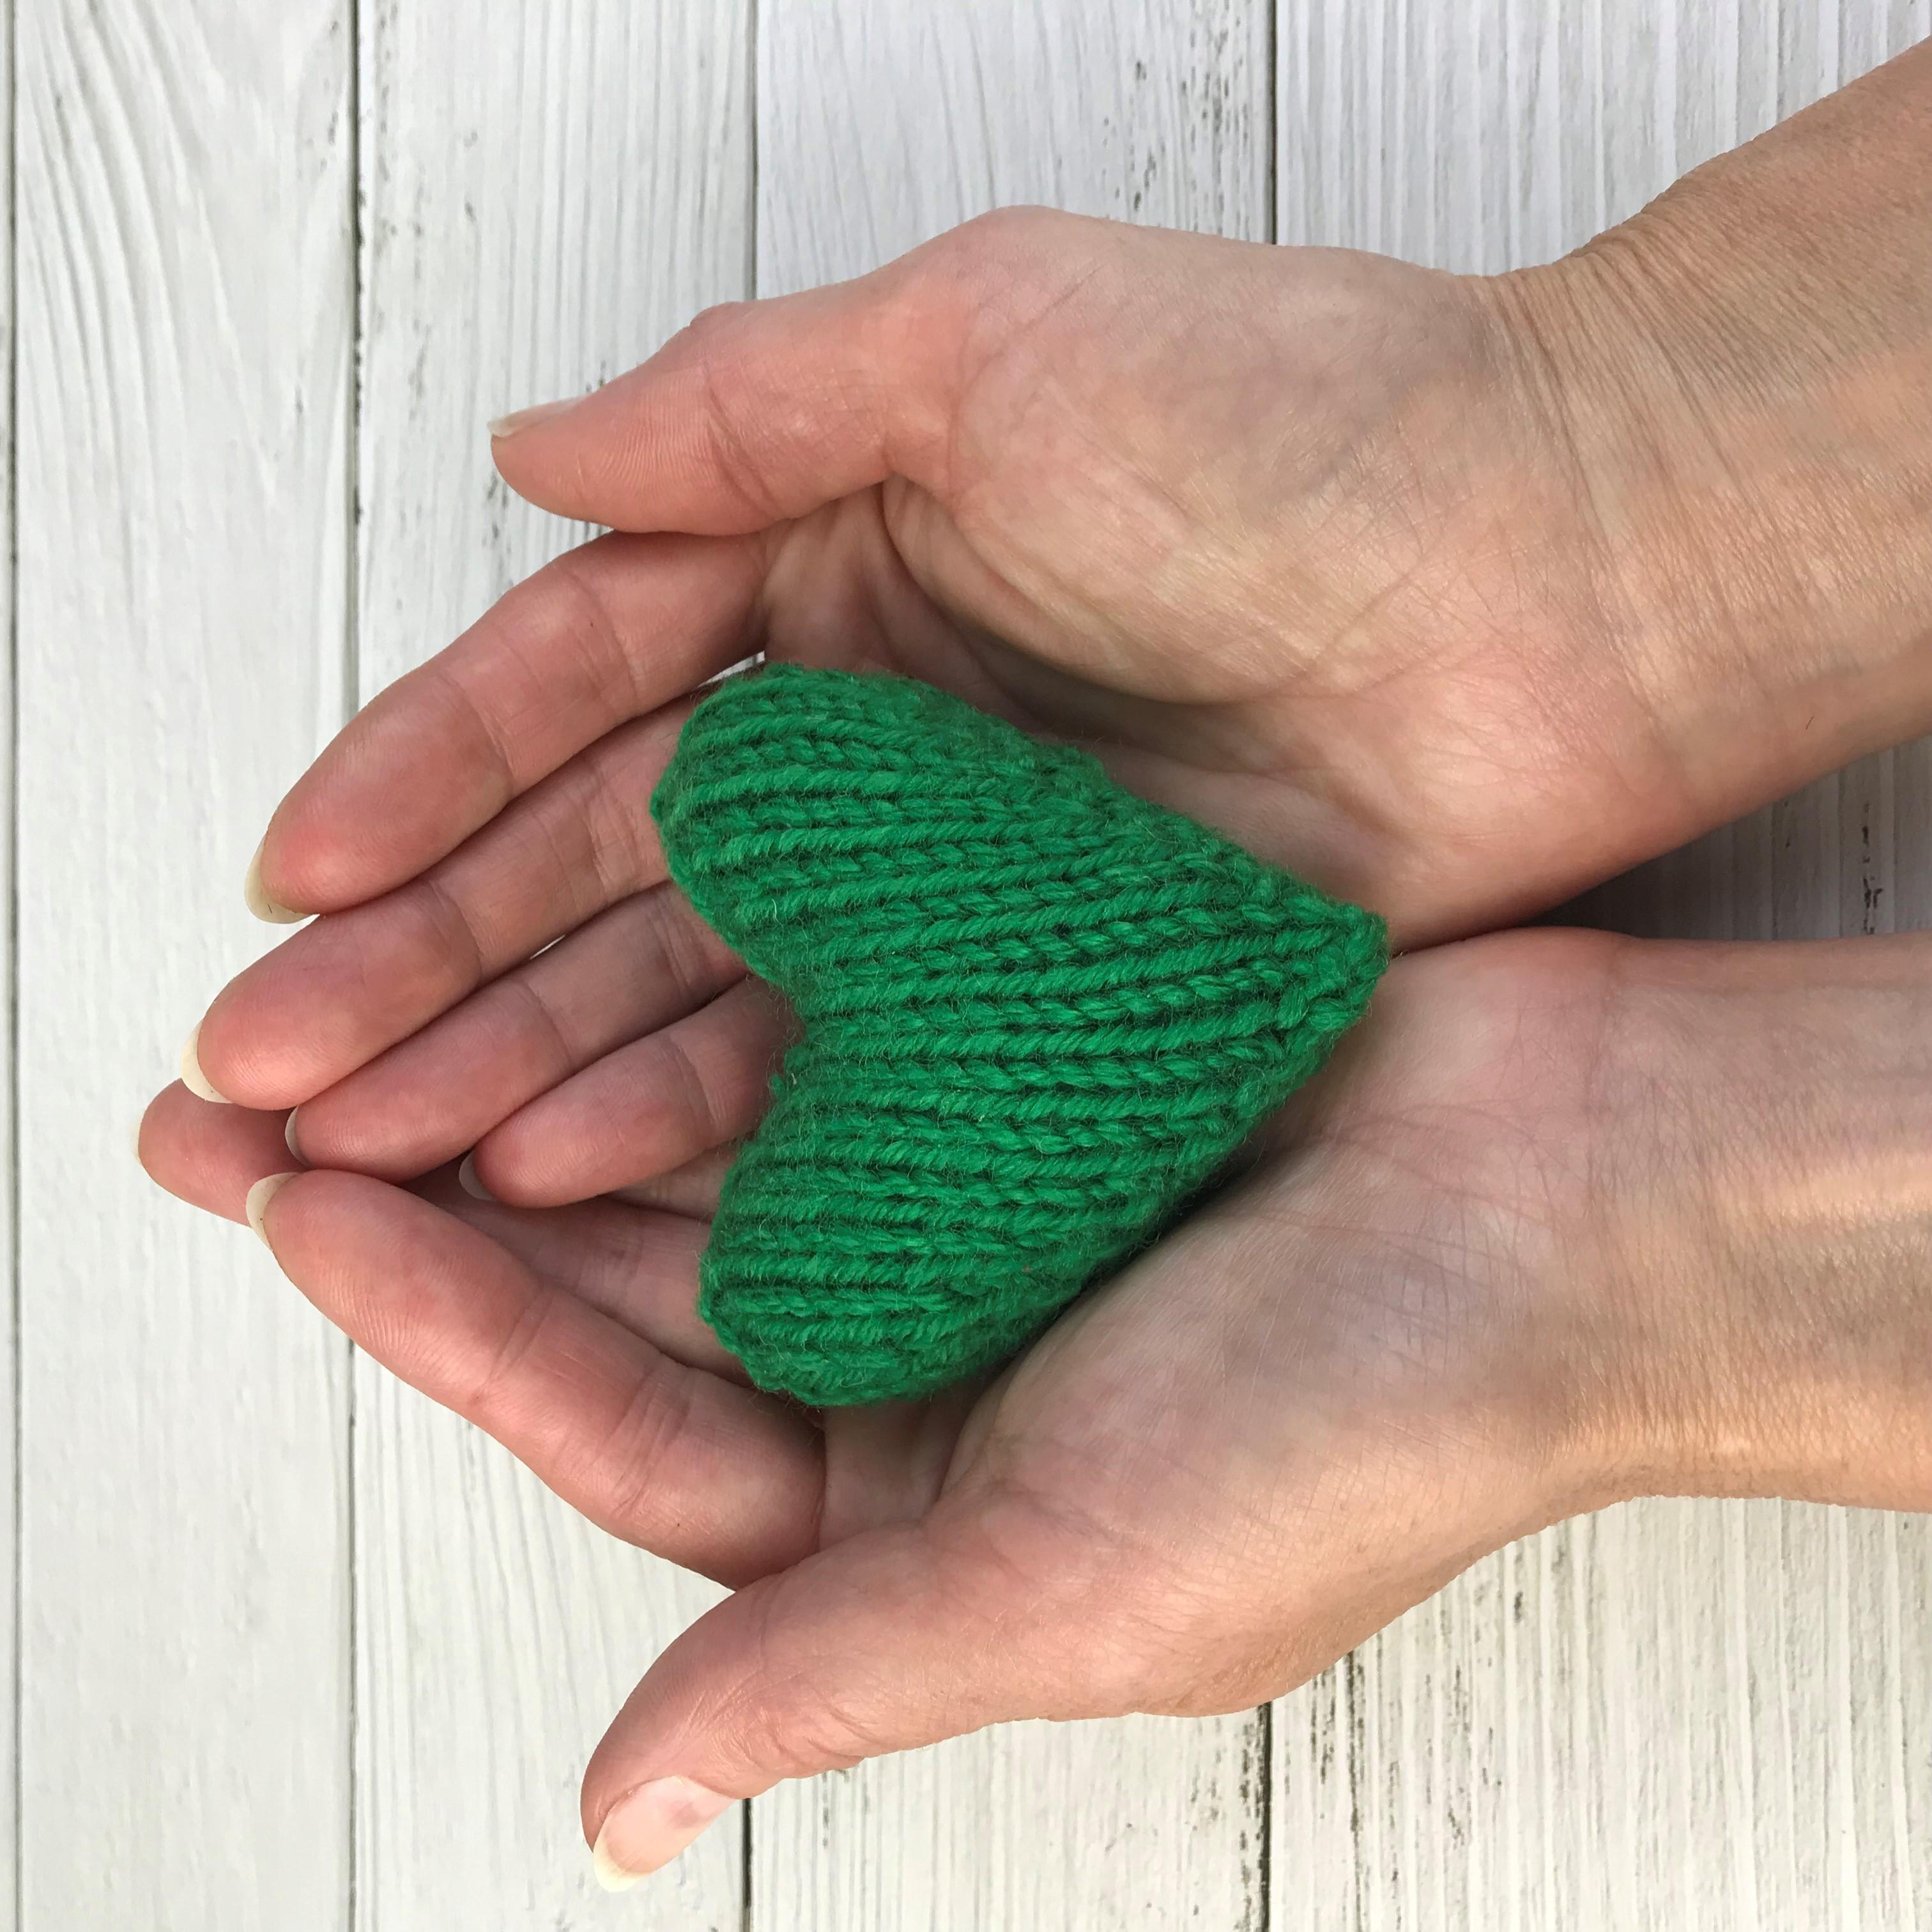 Little Green Hearts for Childline